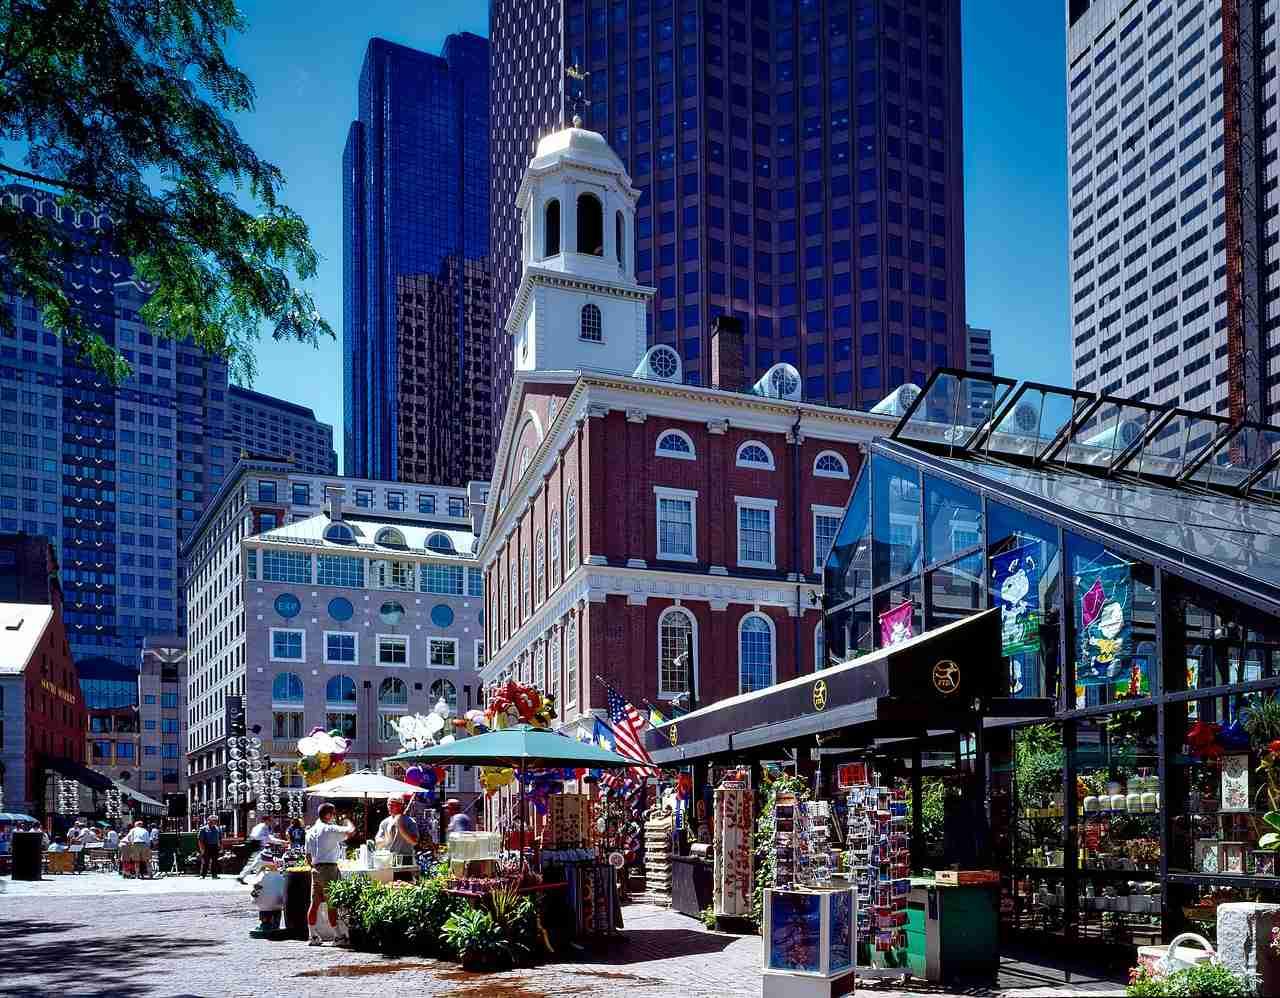 Faneuil Hall Marketplace, Boston, Massachusetts, Visit in USA